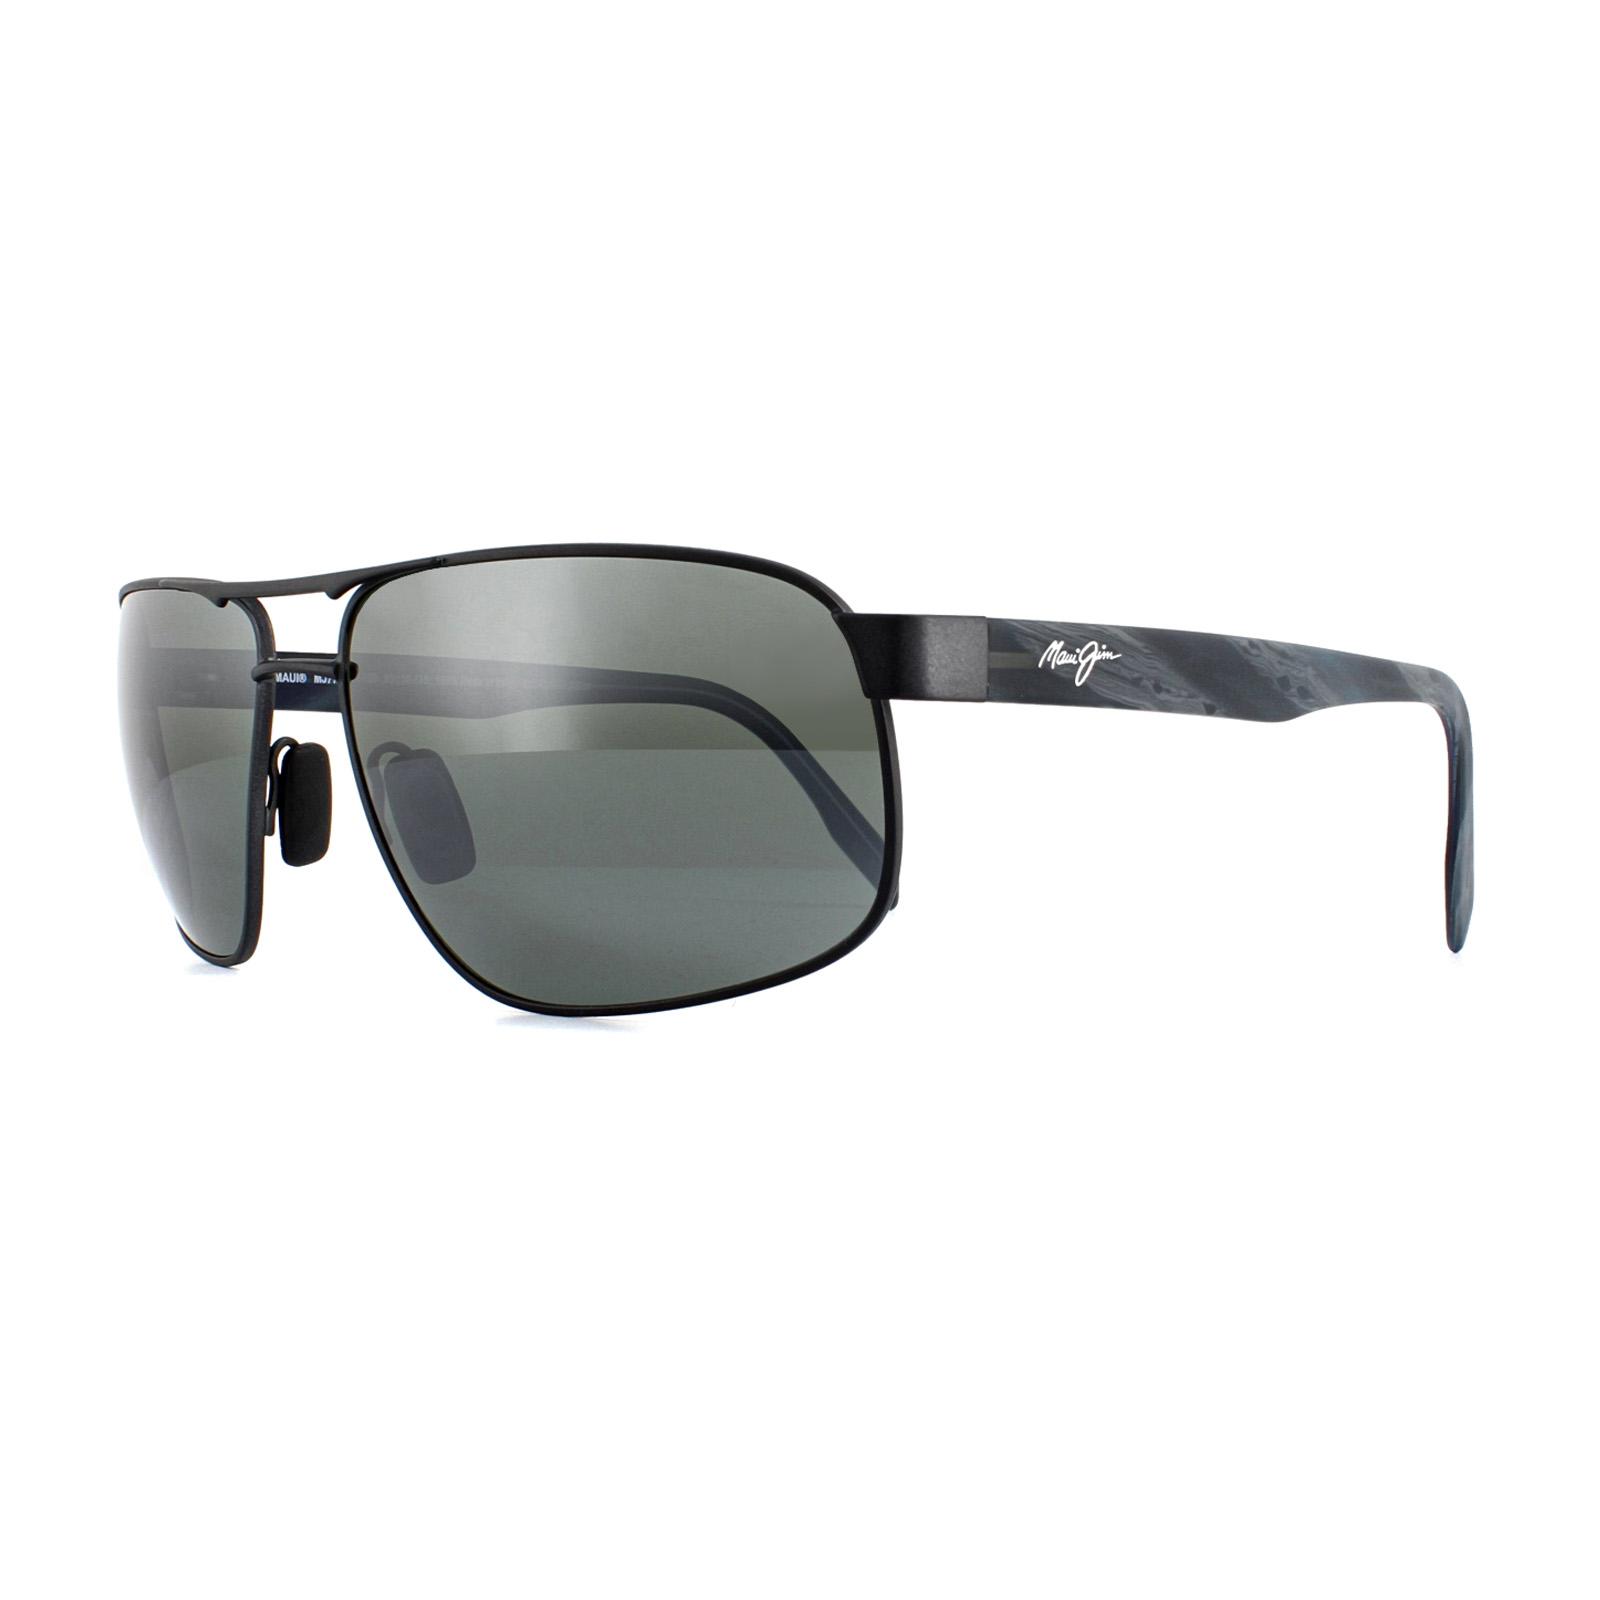 Surf Rider (discontinued) Polarisierte Sonnenbrille   Maui Jim®